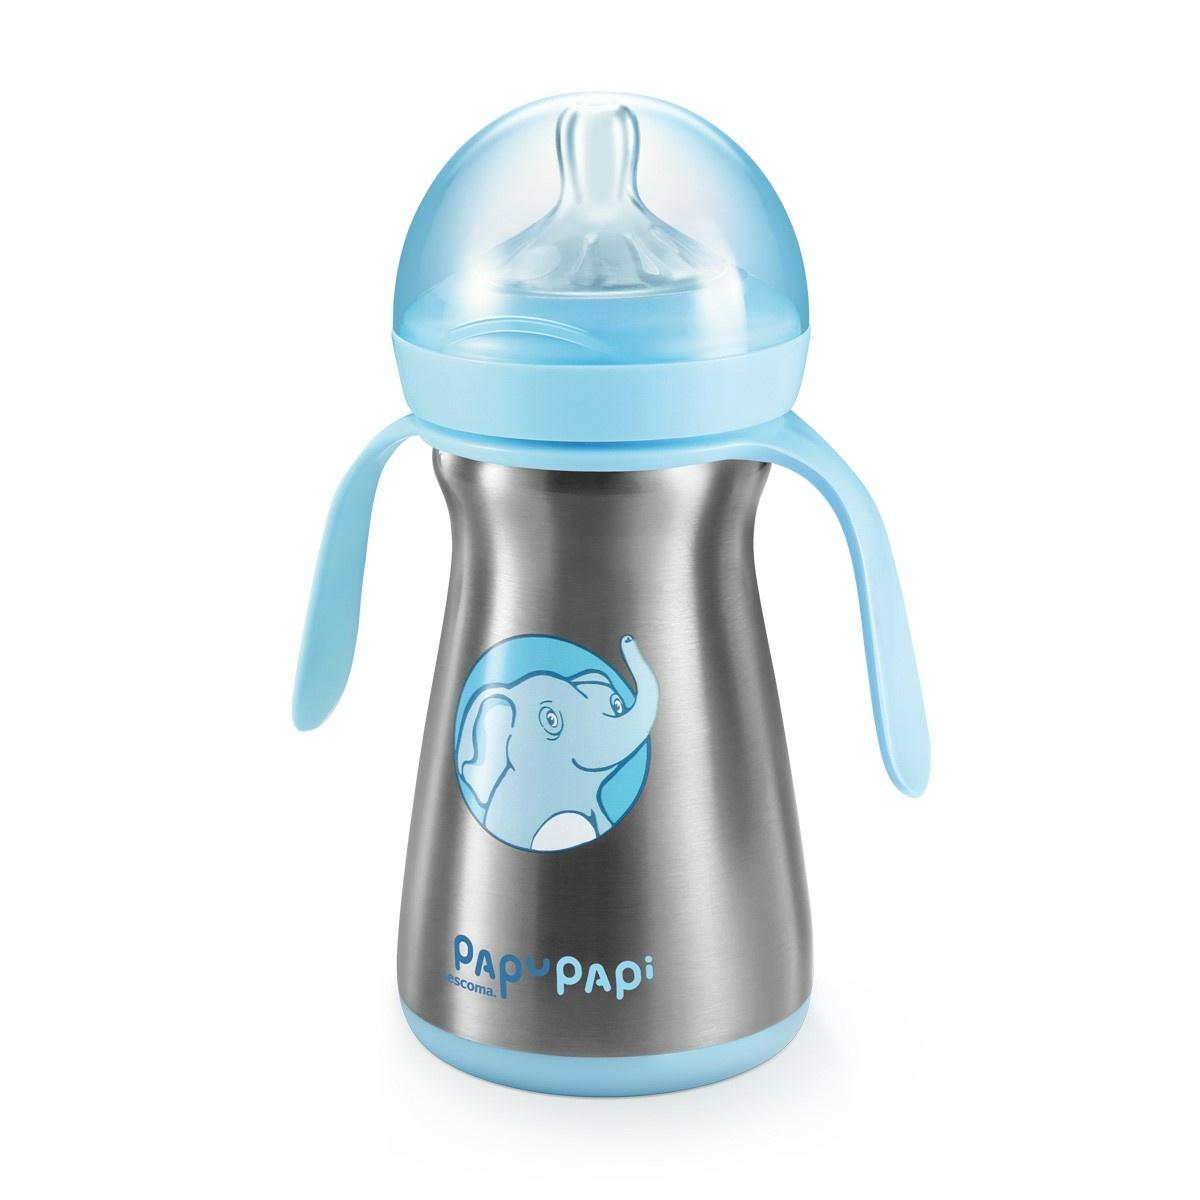 Tescoma Termo láhev PAPU PAPI 200 ml, modrá